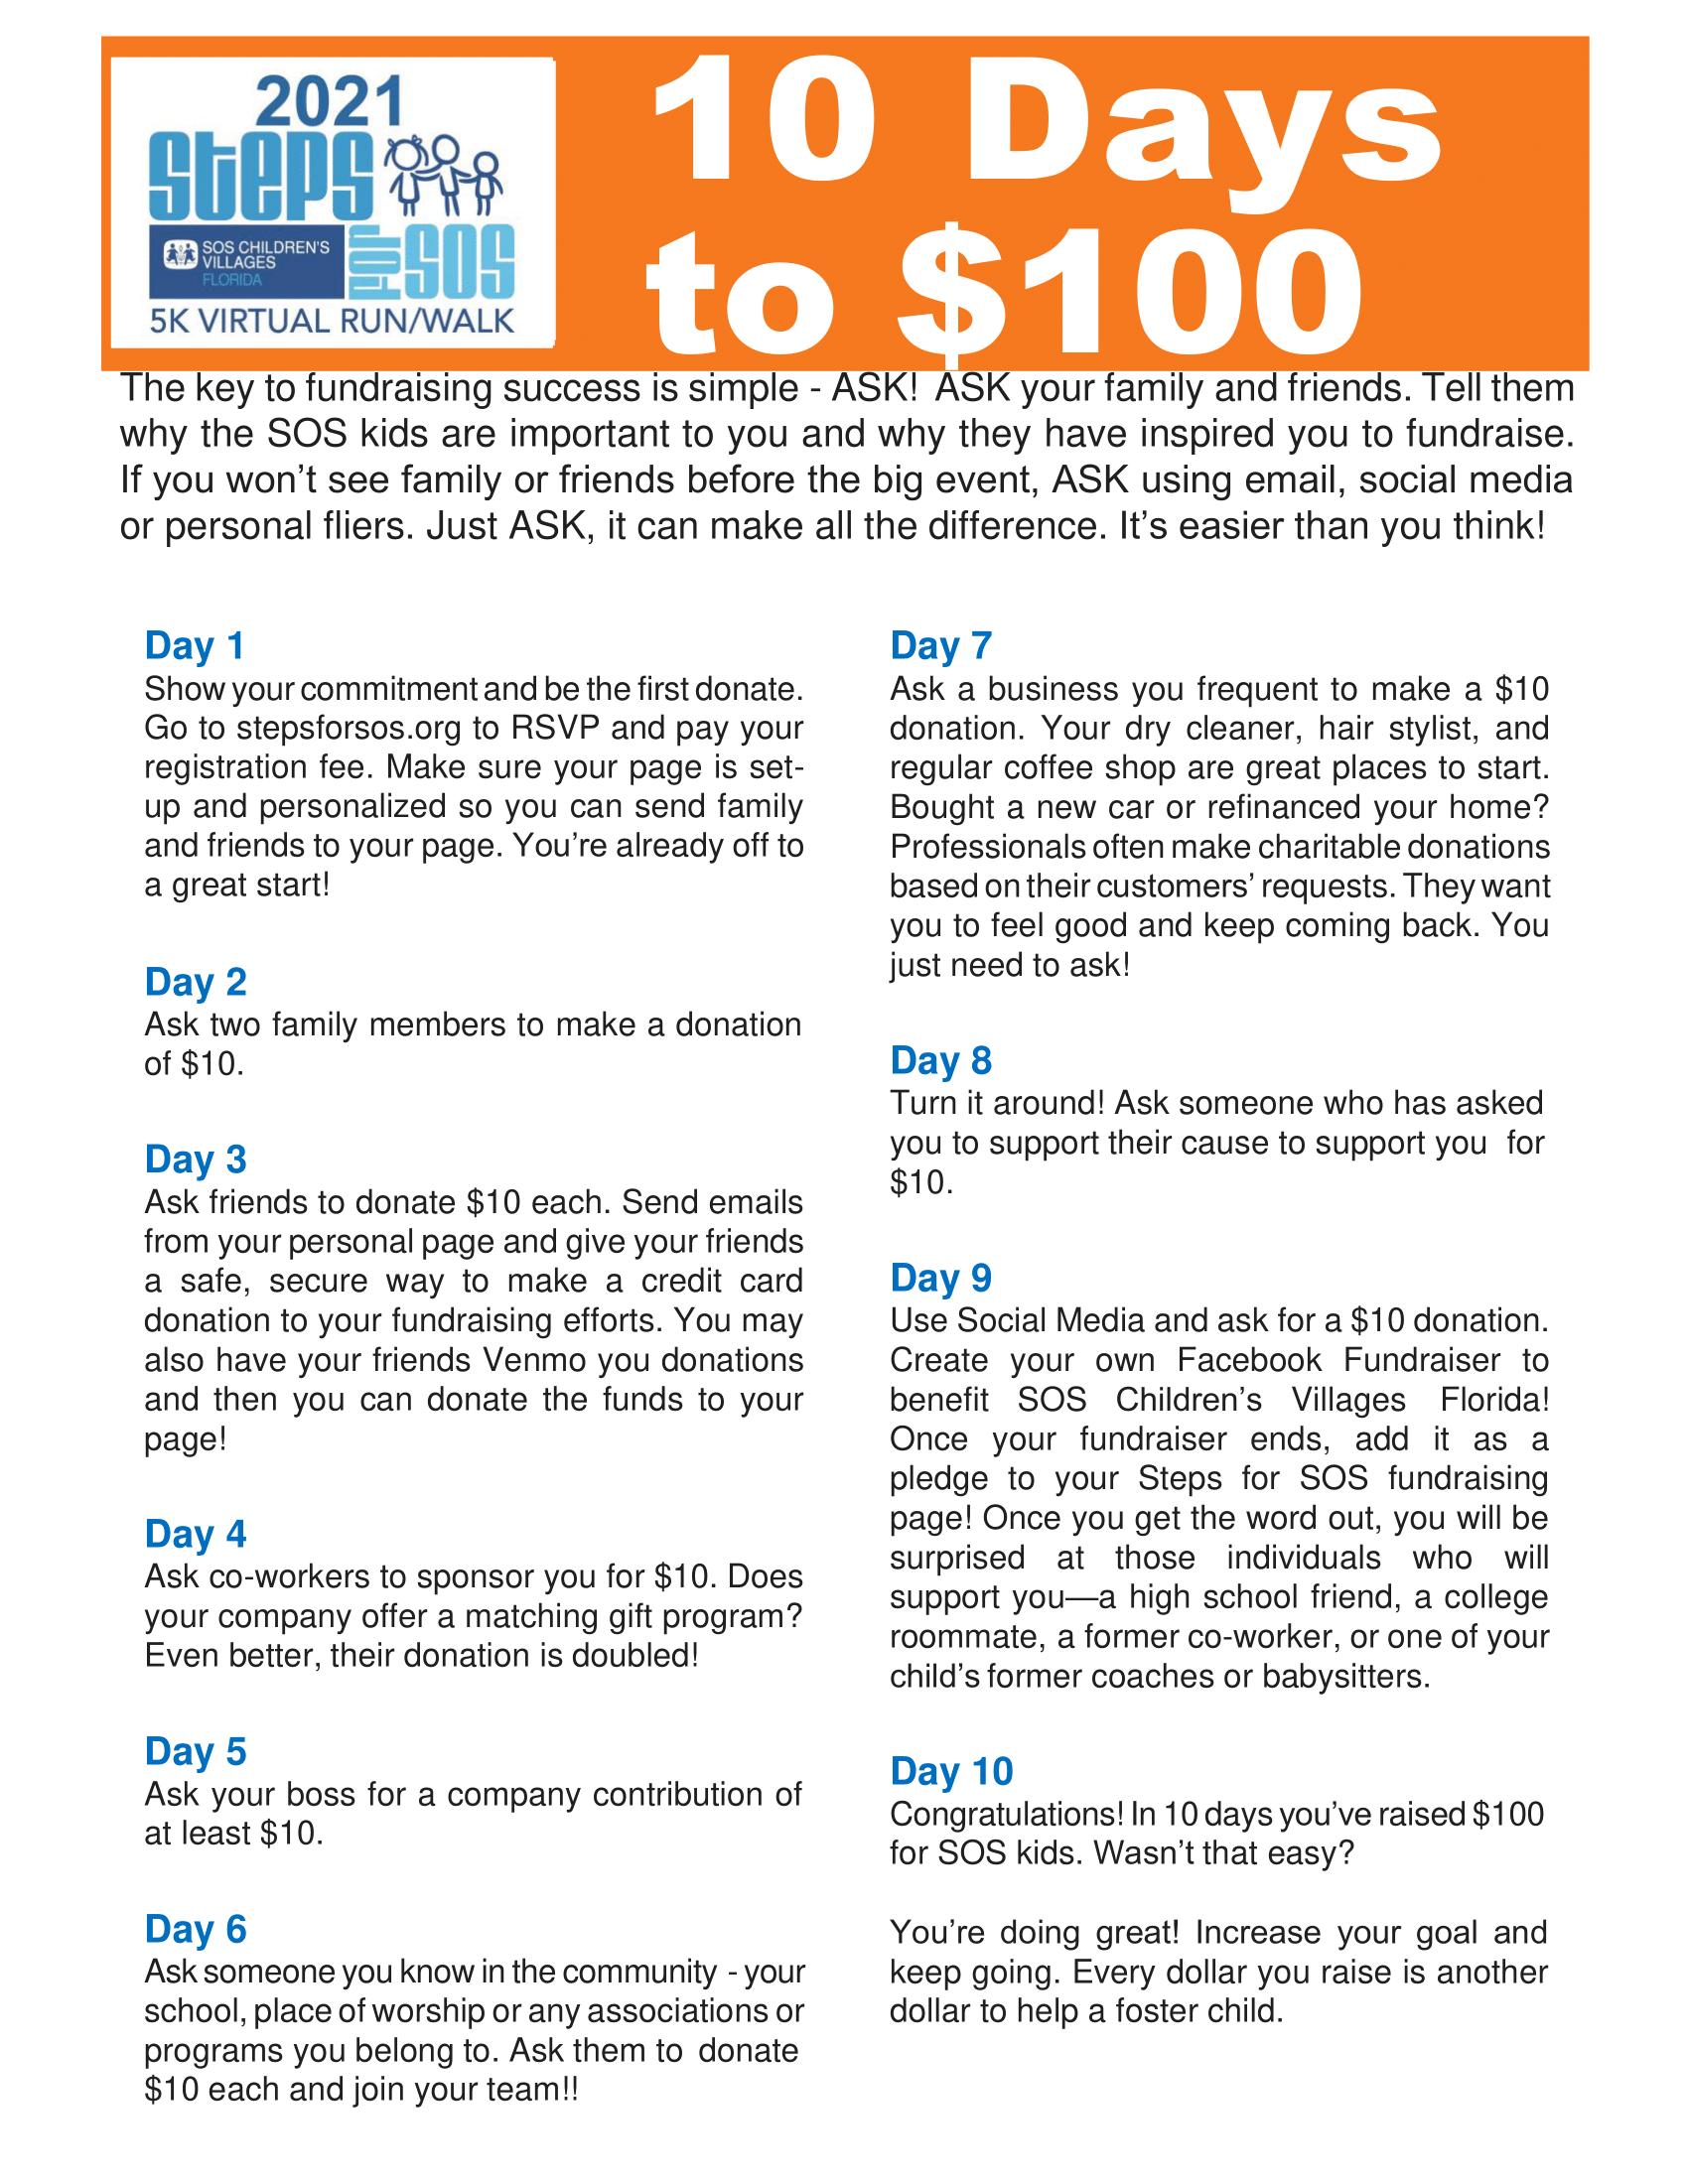 10 Days to $100